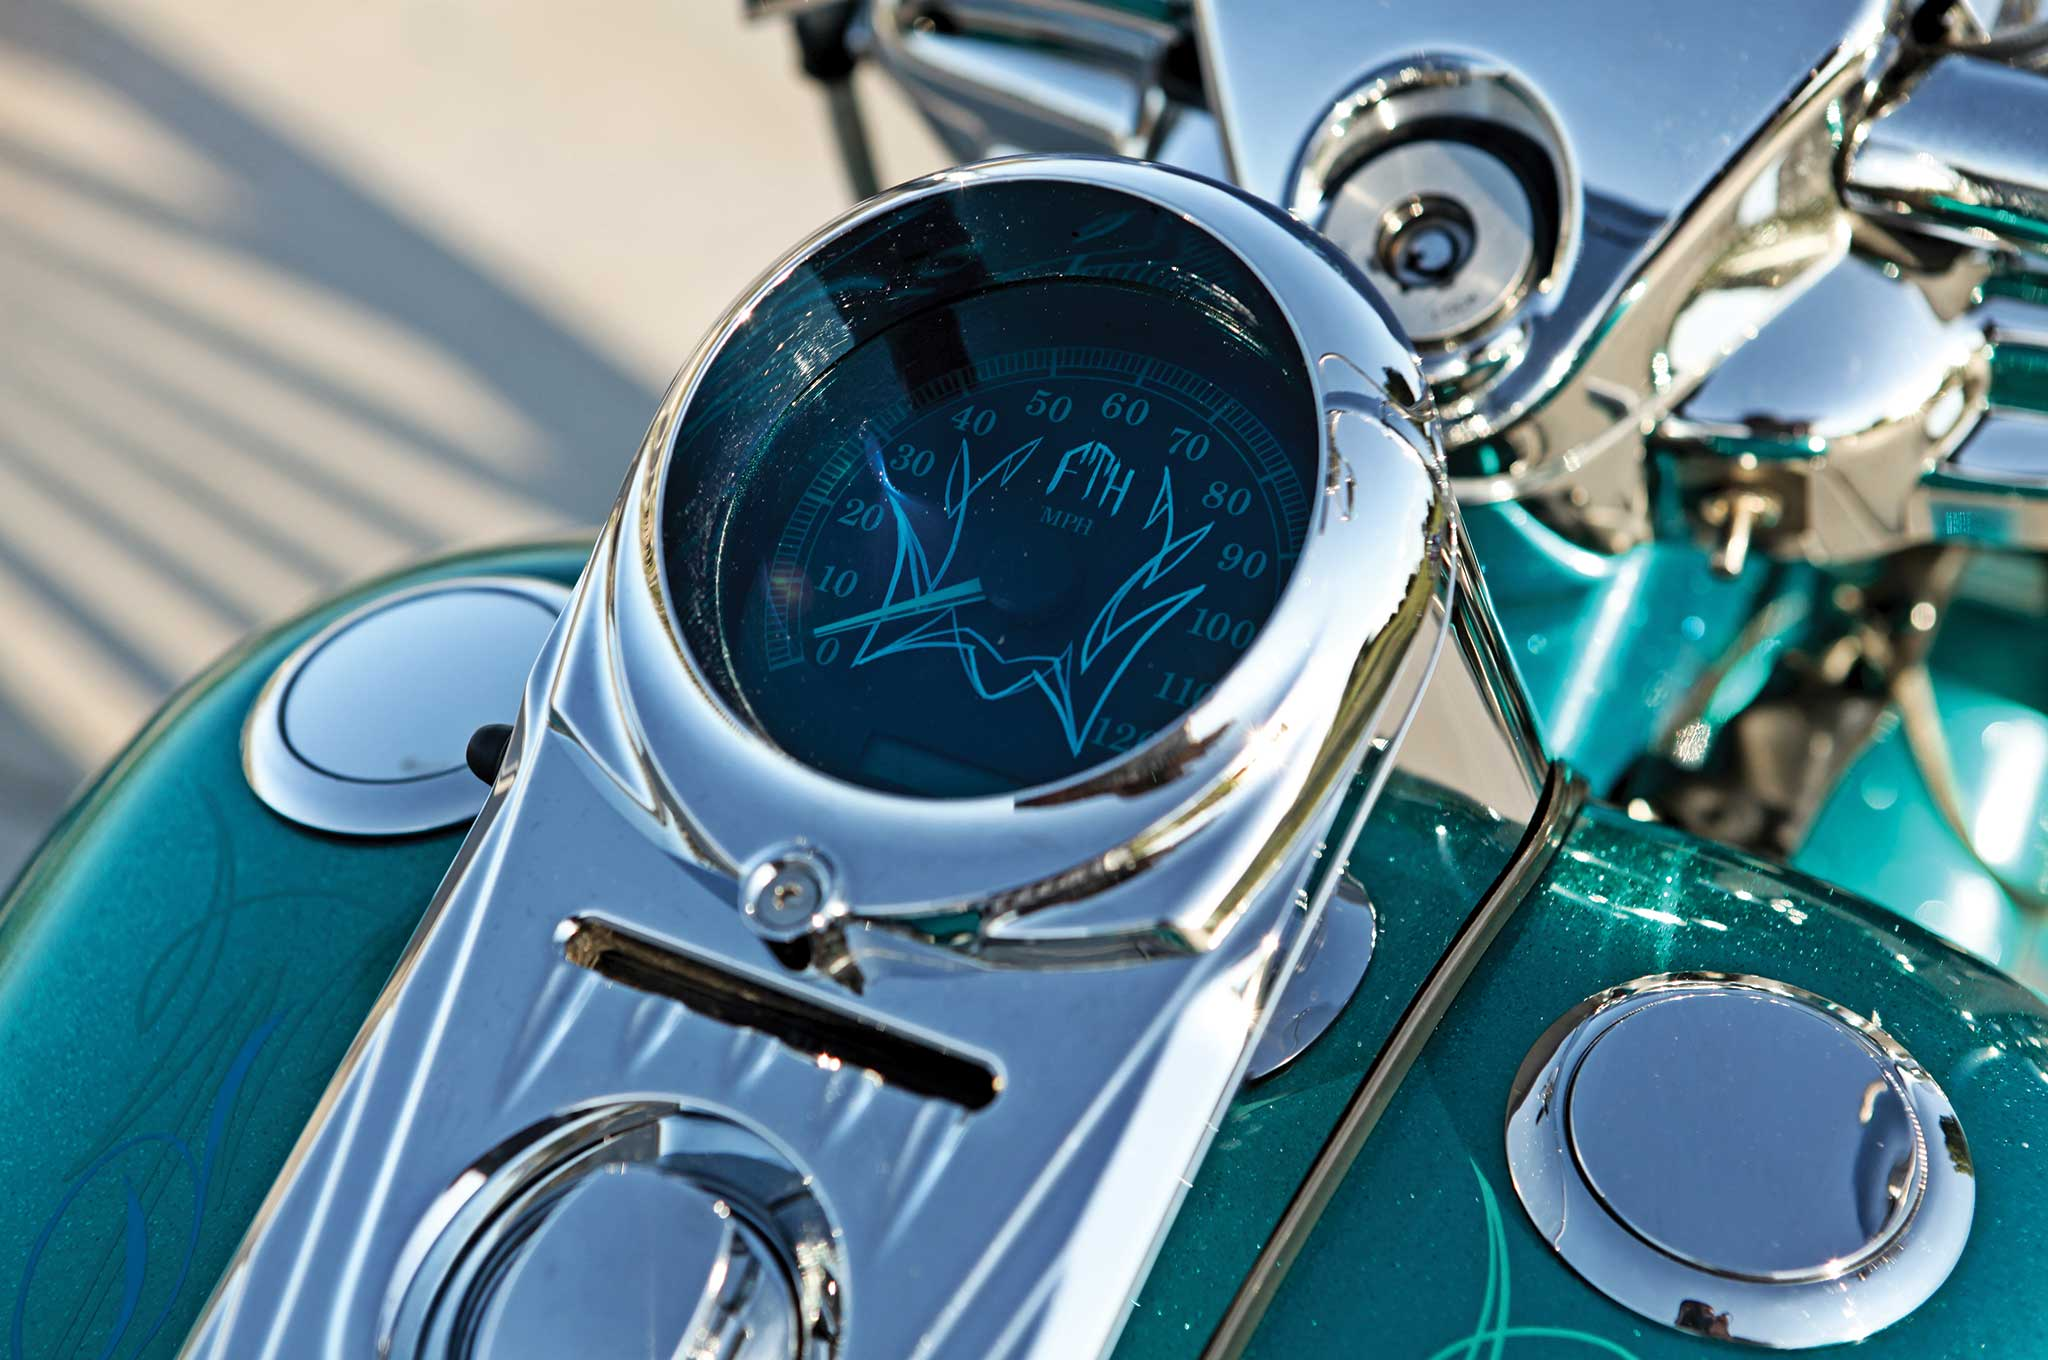 2004 harley davidson road king speedometer 004